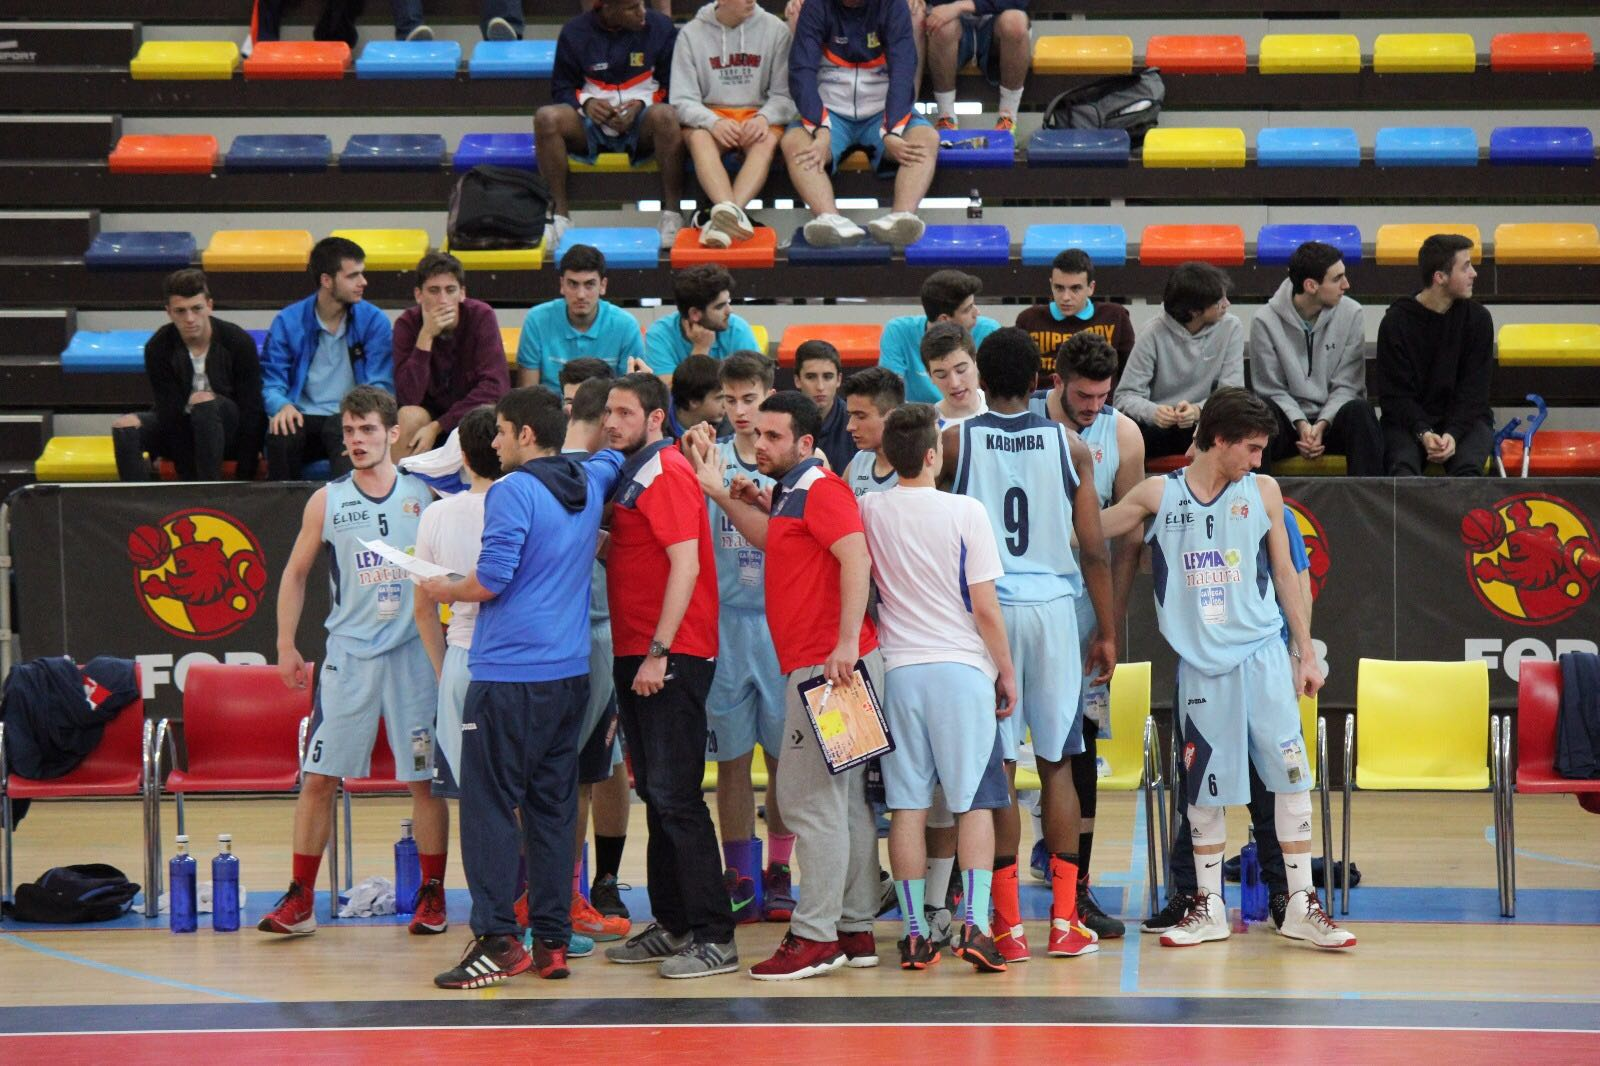 Gustavo Soares Mota Campeonato de España Junior Masculino